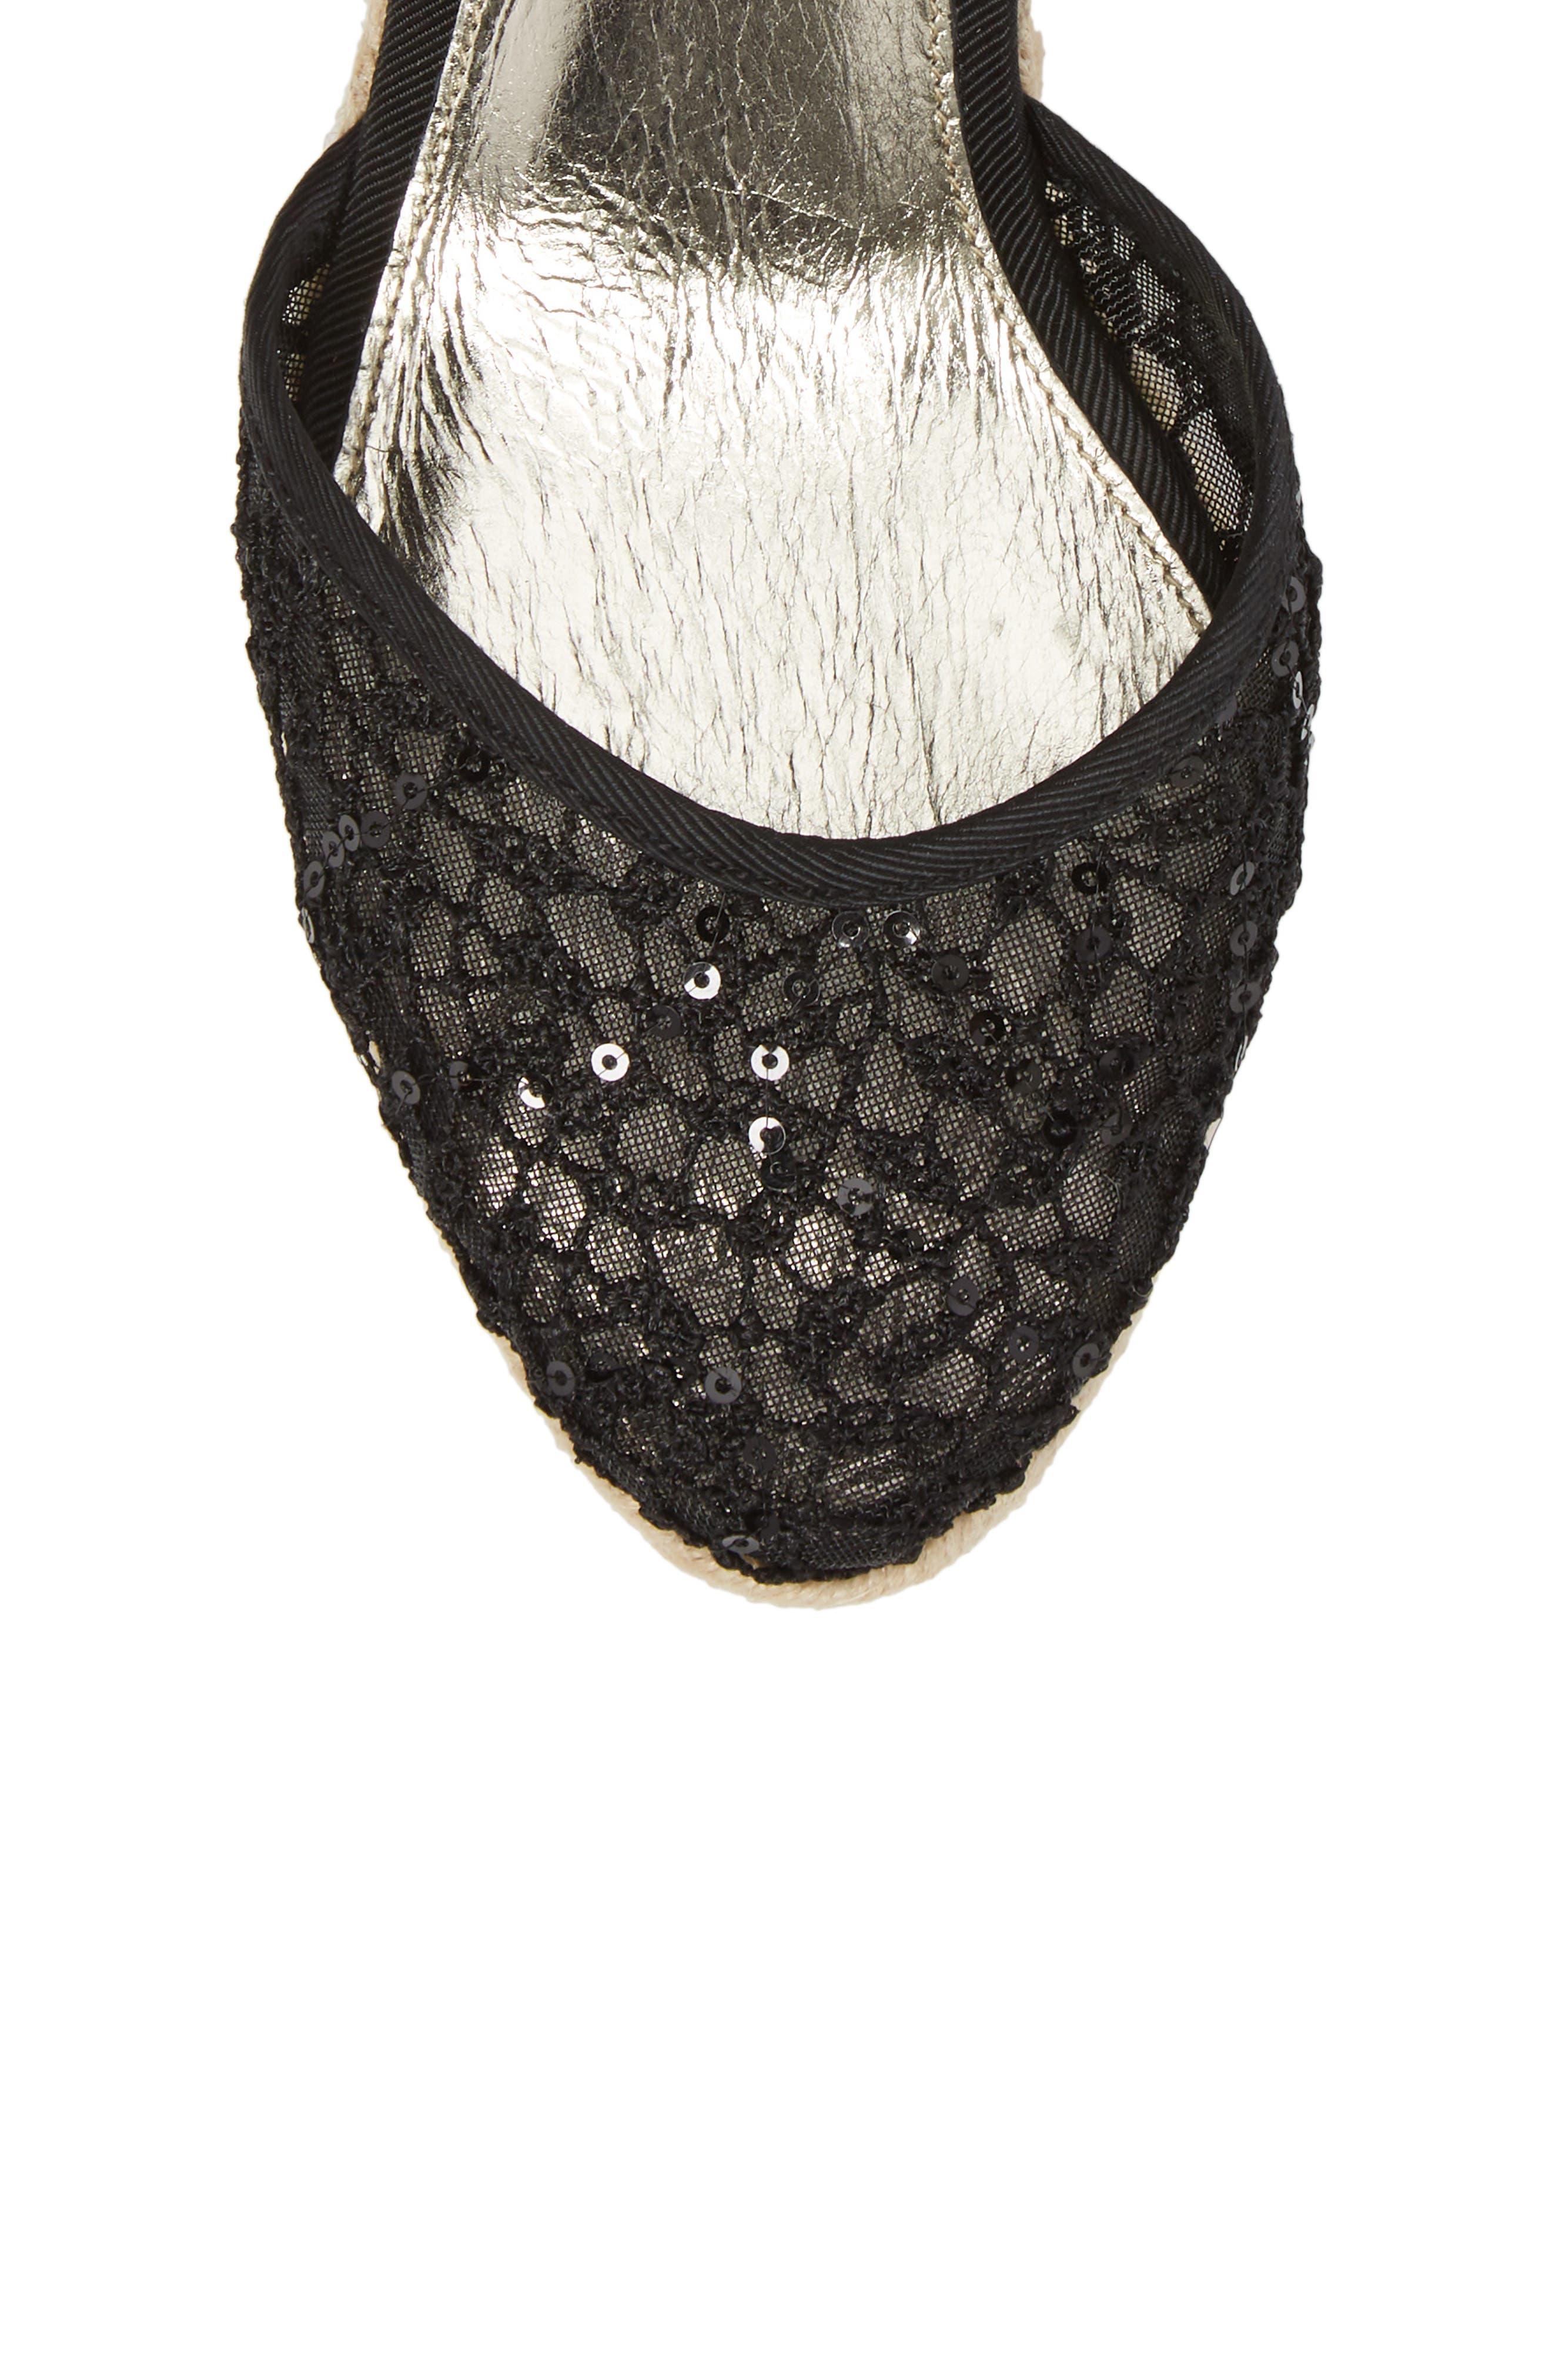 ADRIANNA PAPELL, Pamela Espadrille Wedge Sandal, Alternate thumbnail 5, color, BLACK LACE FABRIC